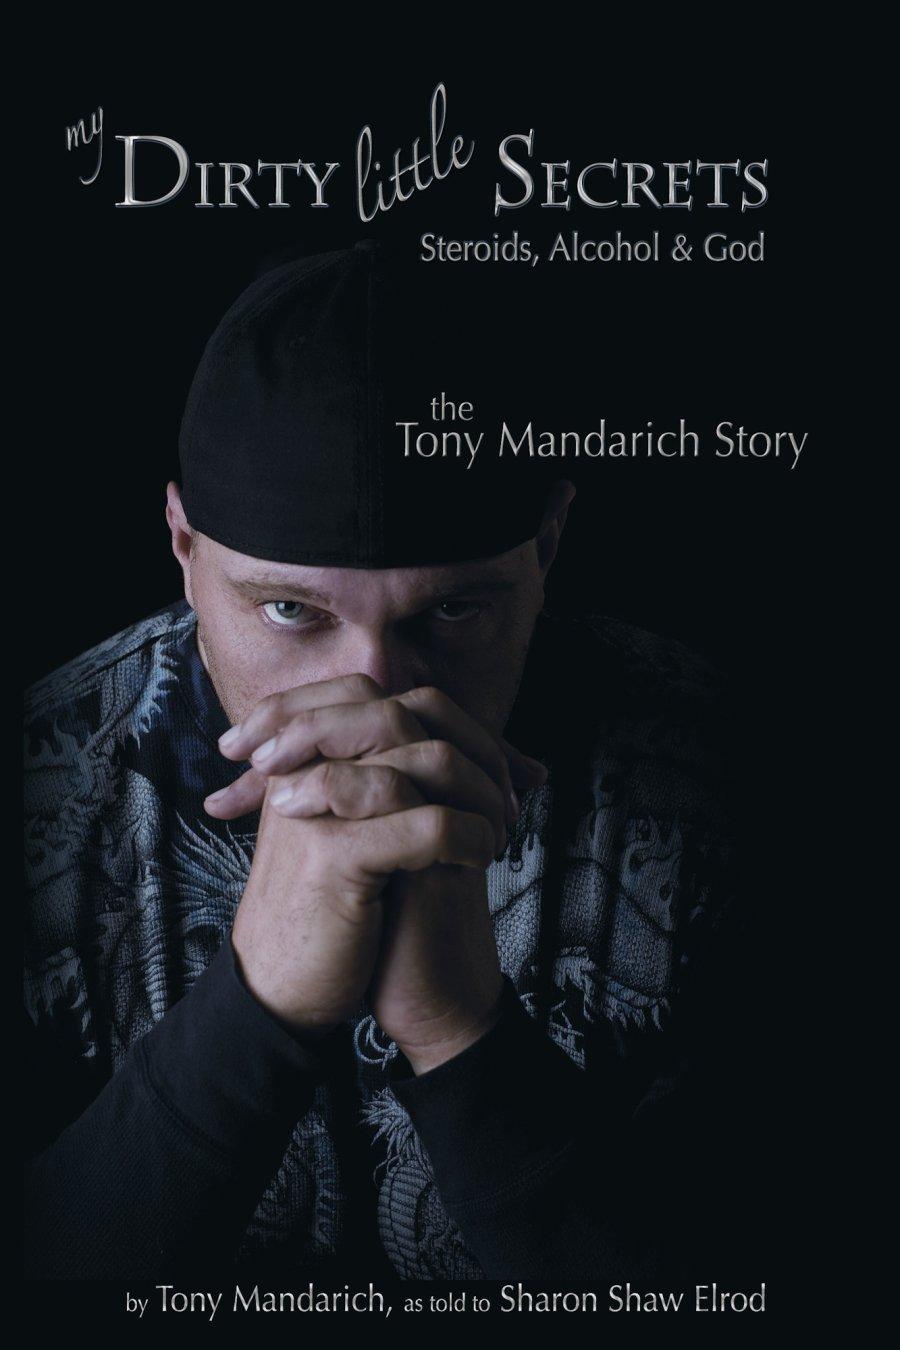 My Dirty Little Secrets - Steroids, Alcohol & Drugs: The Tony Mandarich Story. 978-1-932690-78-1